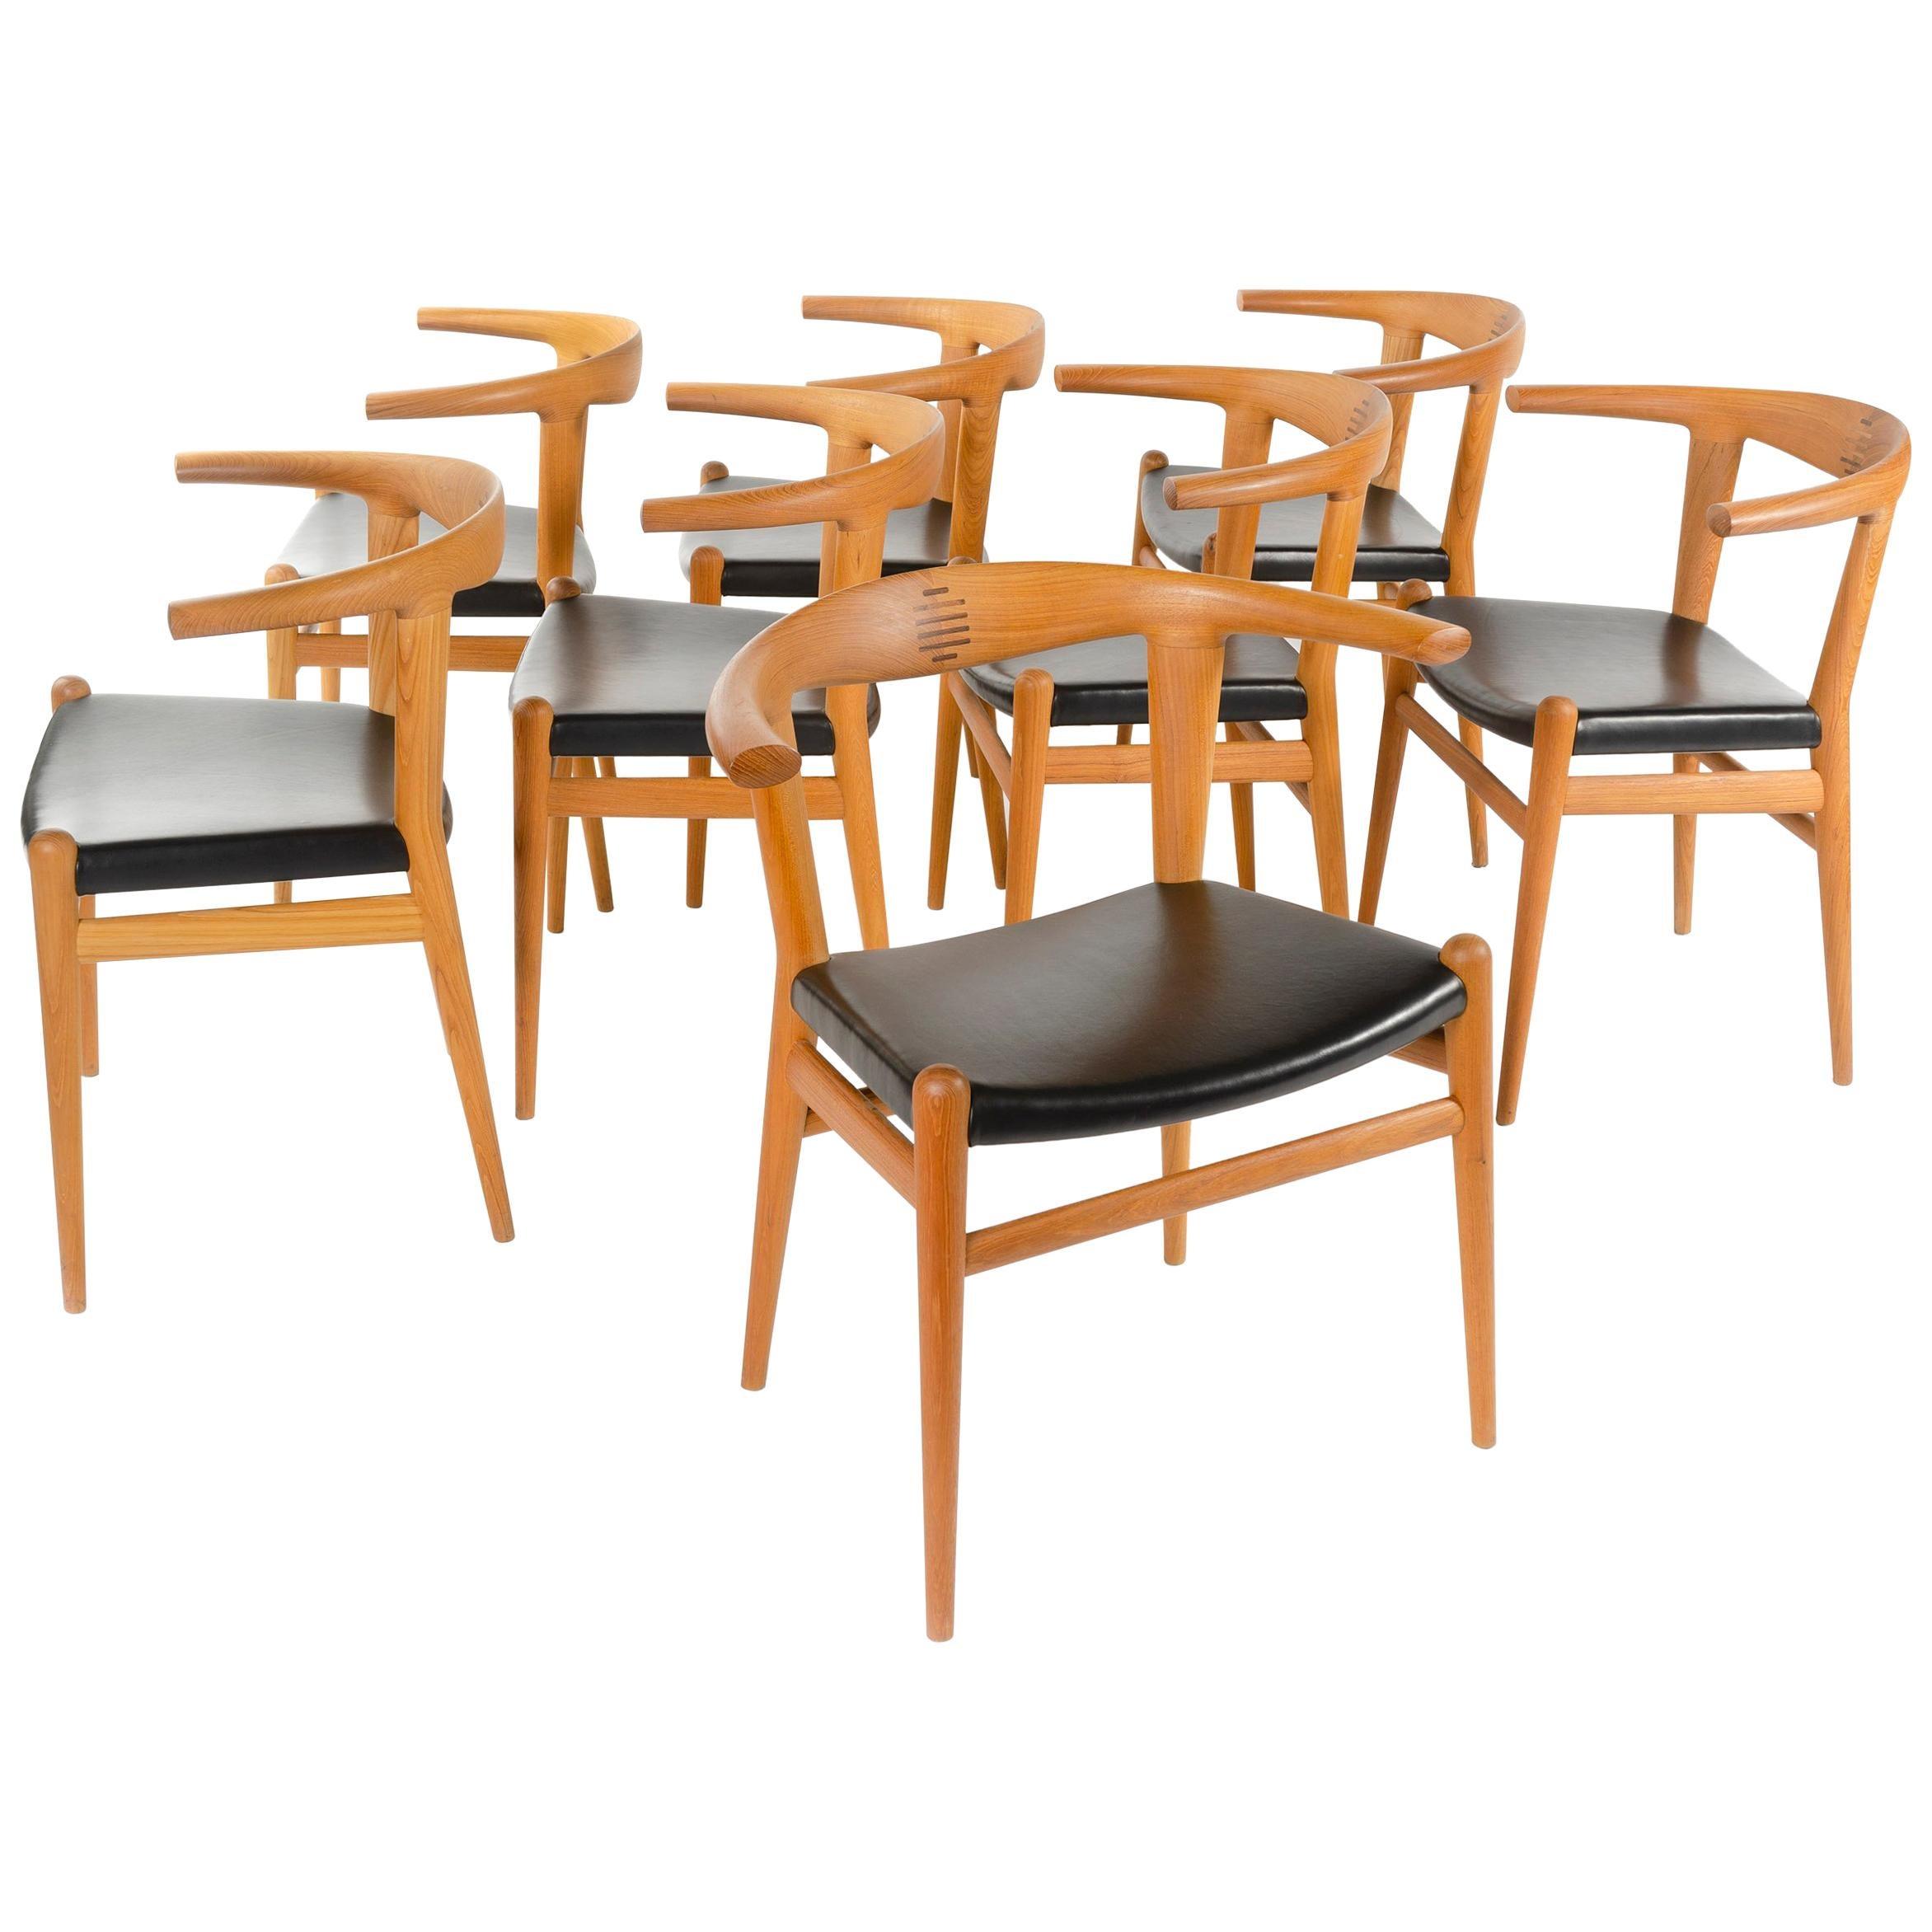 PP518 Limited Production Bullhorn Chair Set of 8 by Hans J. Wegner for PP Møbler